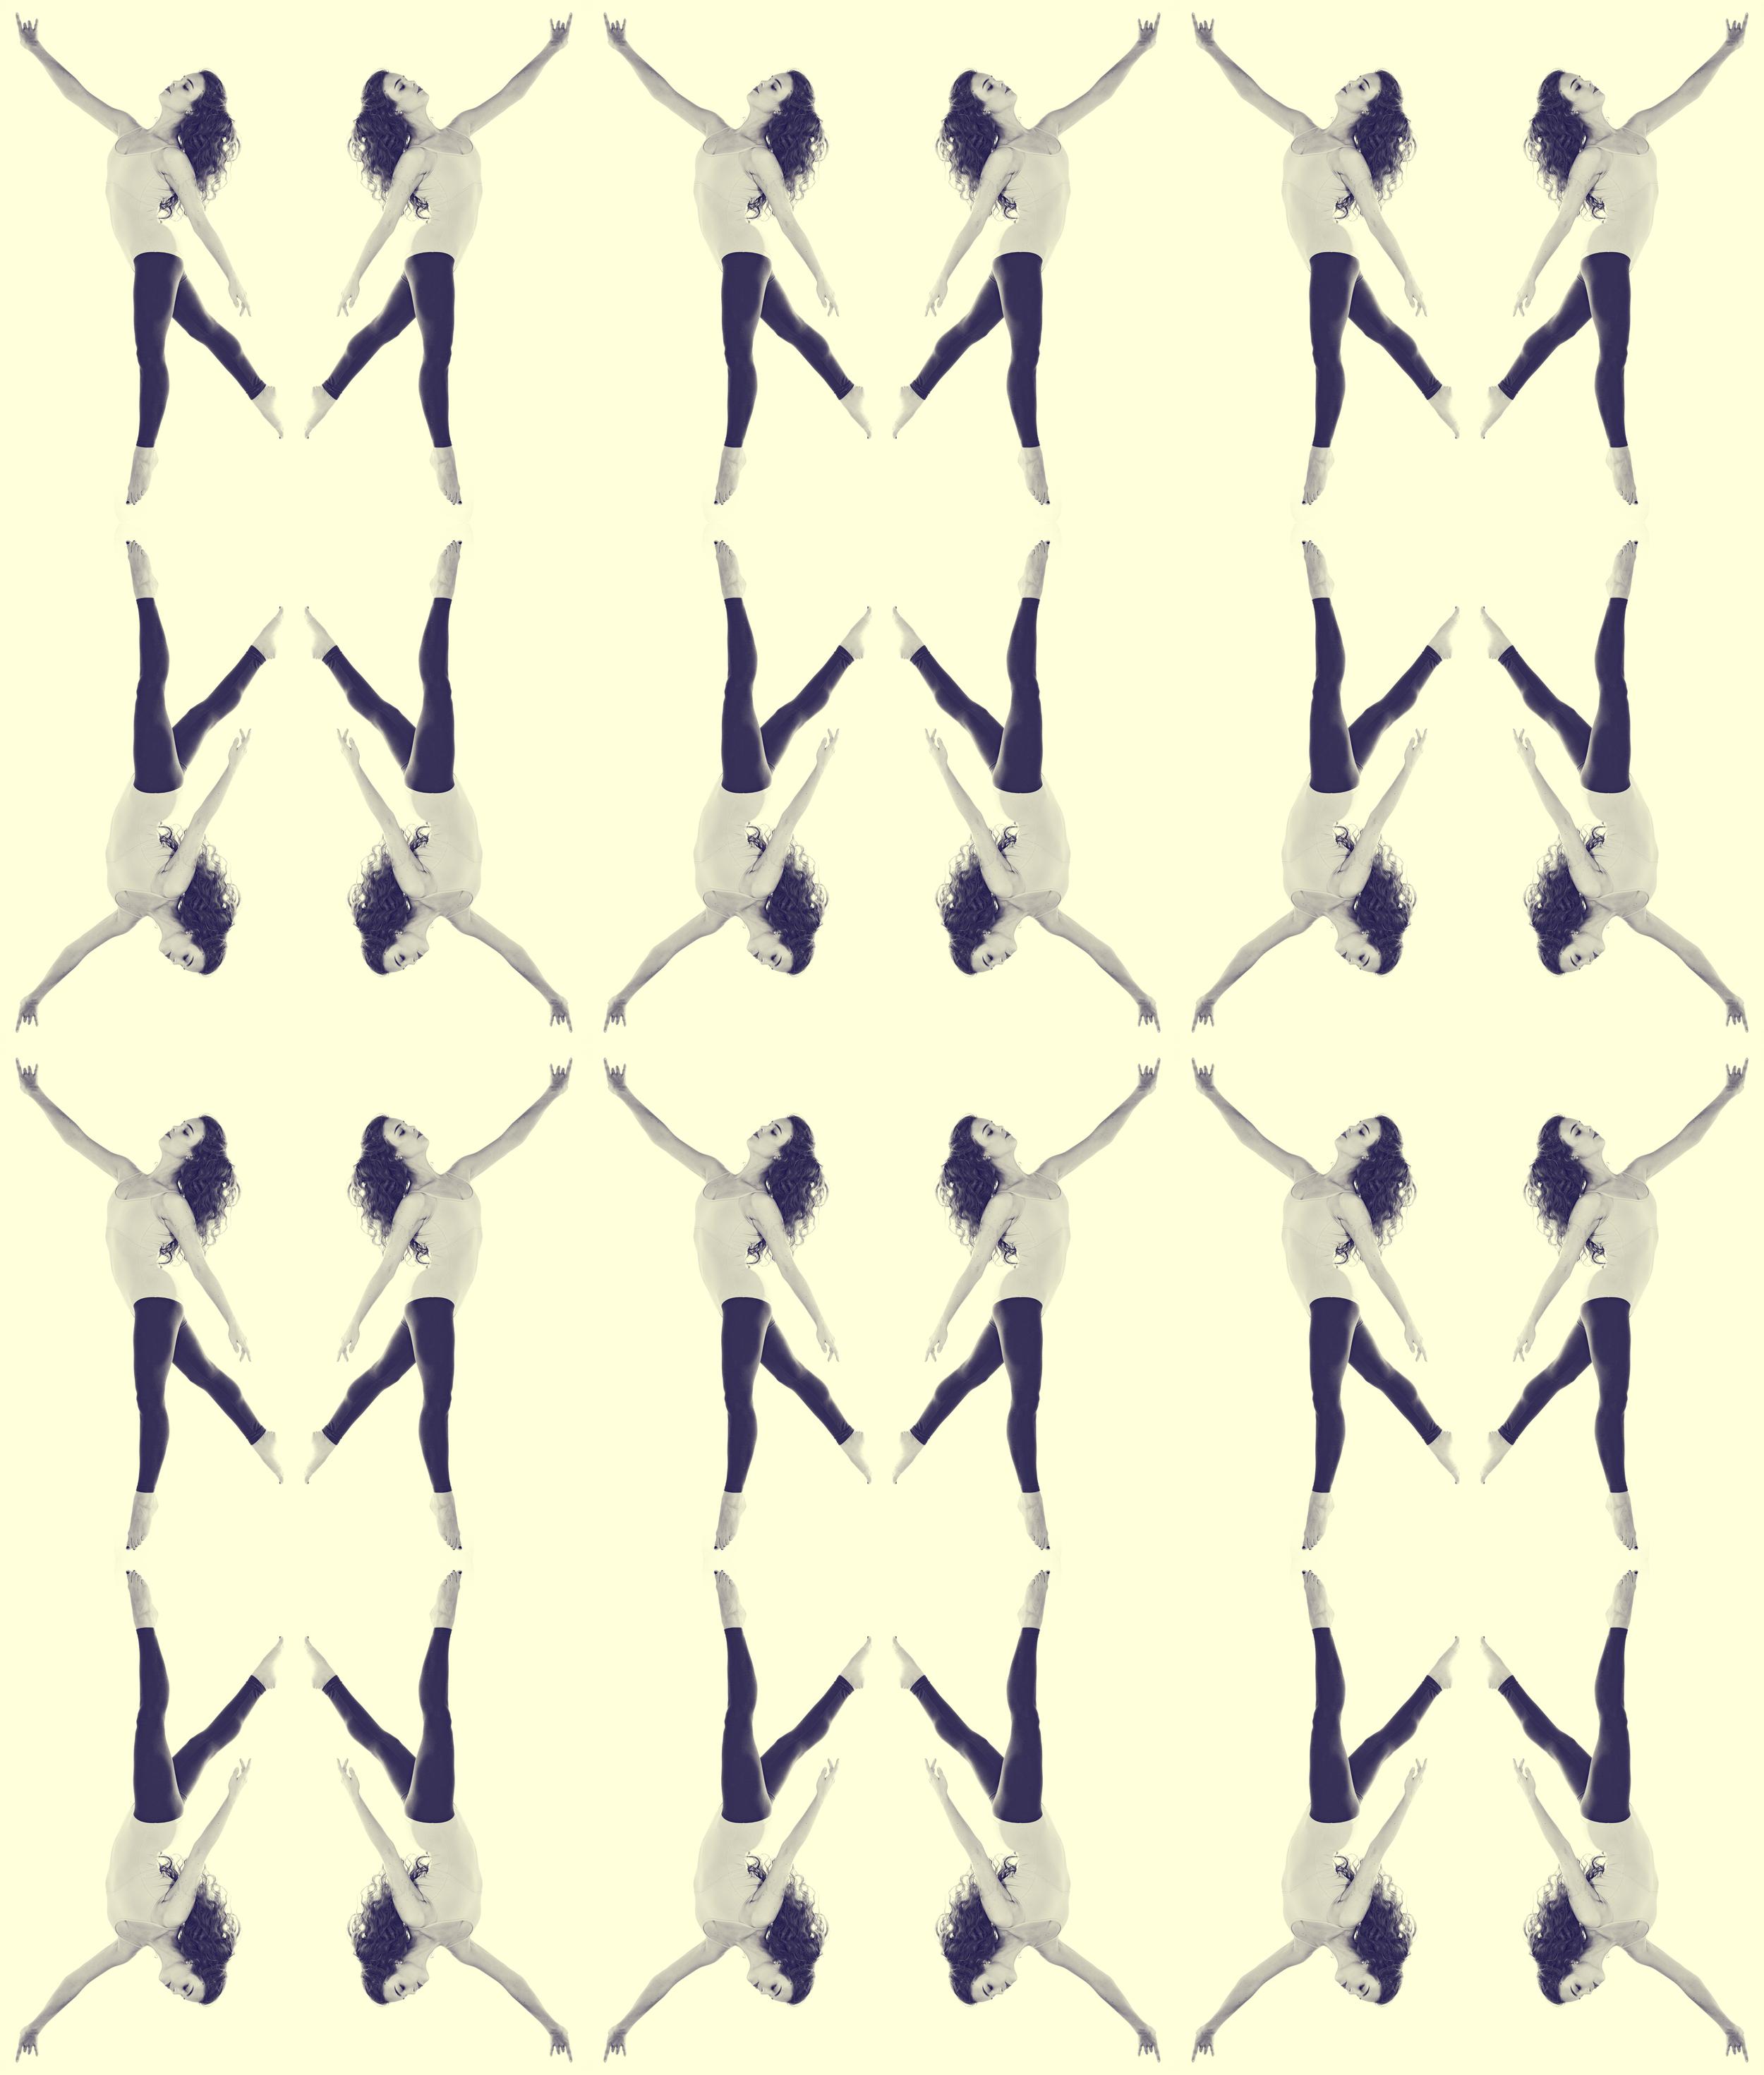 formcollage12.jpg